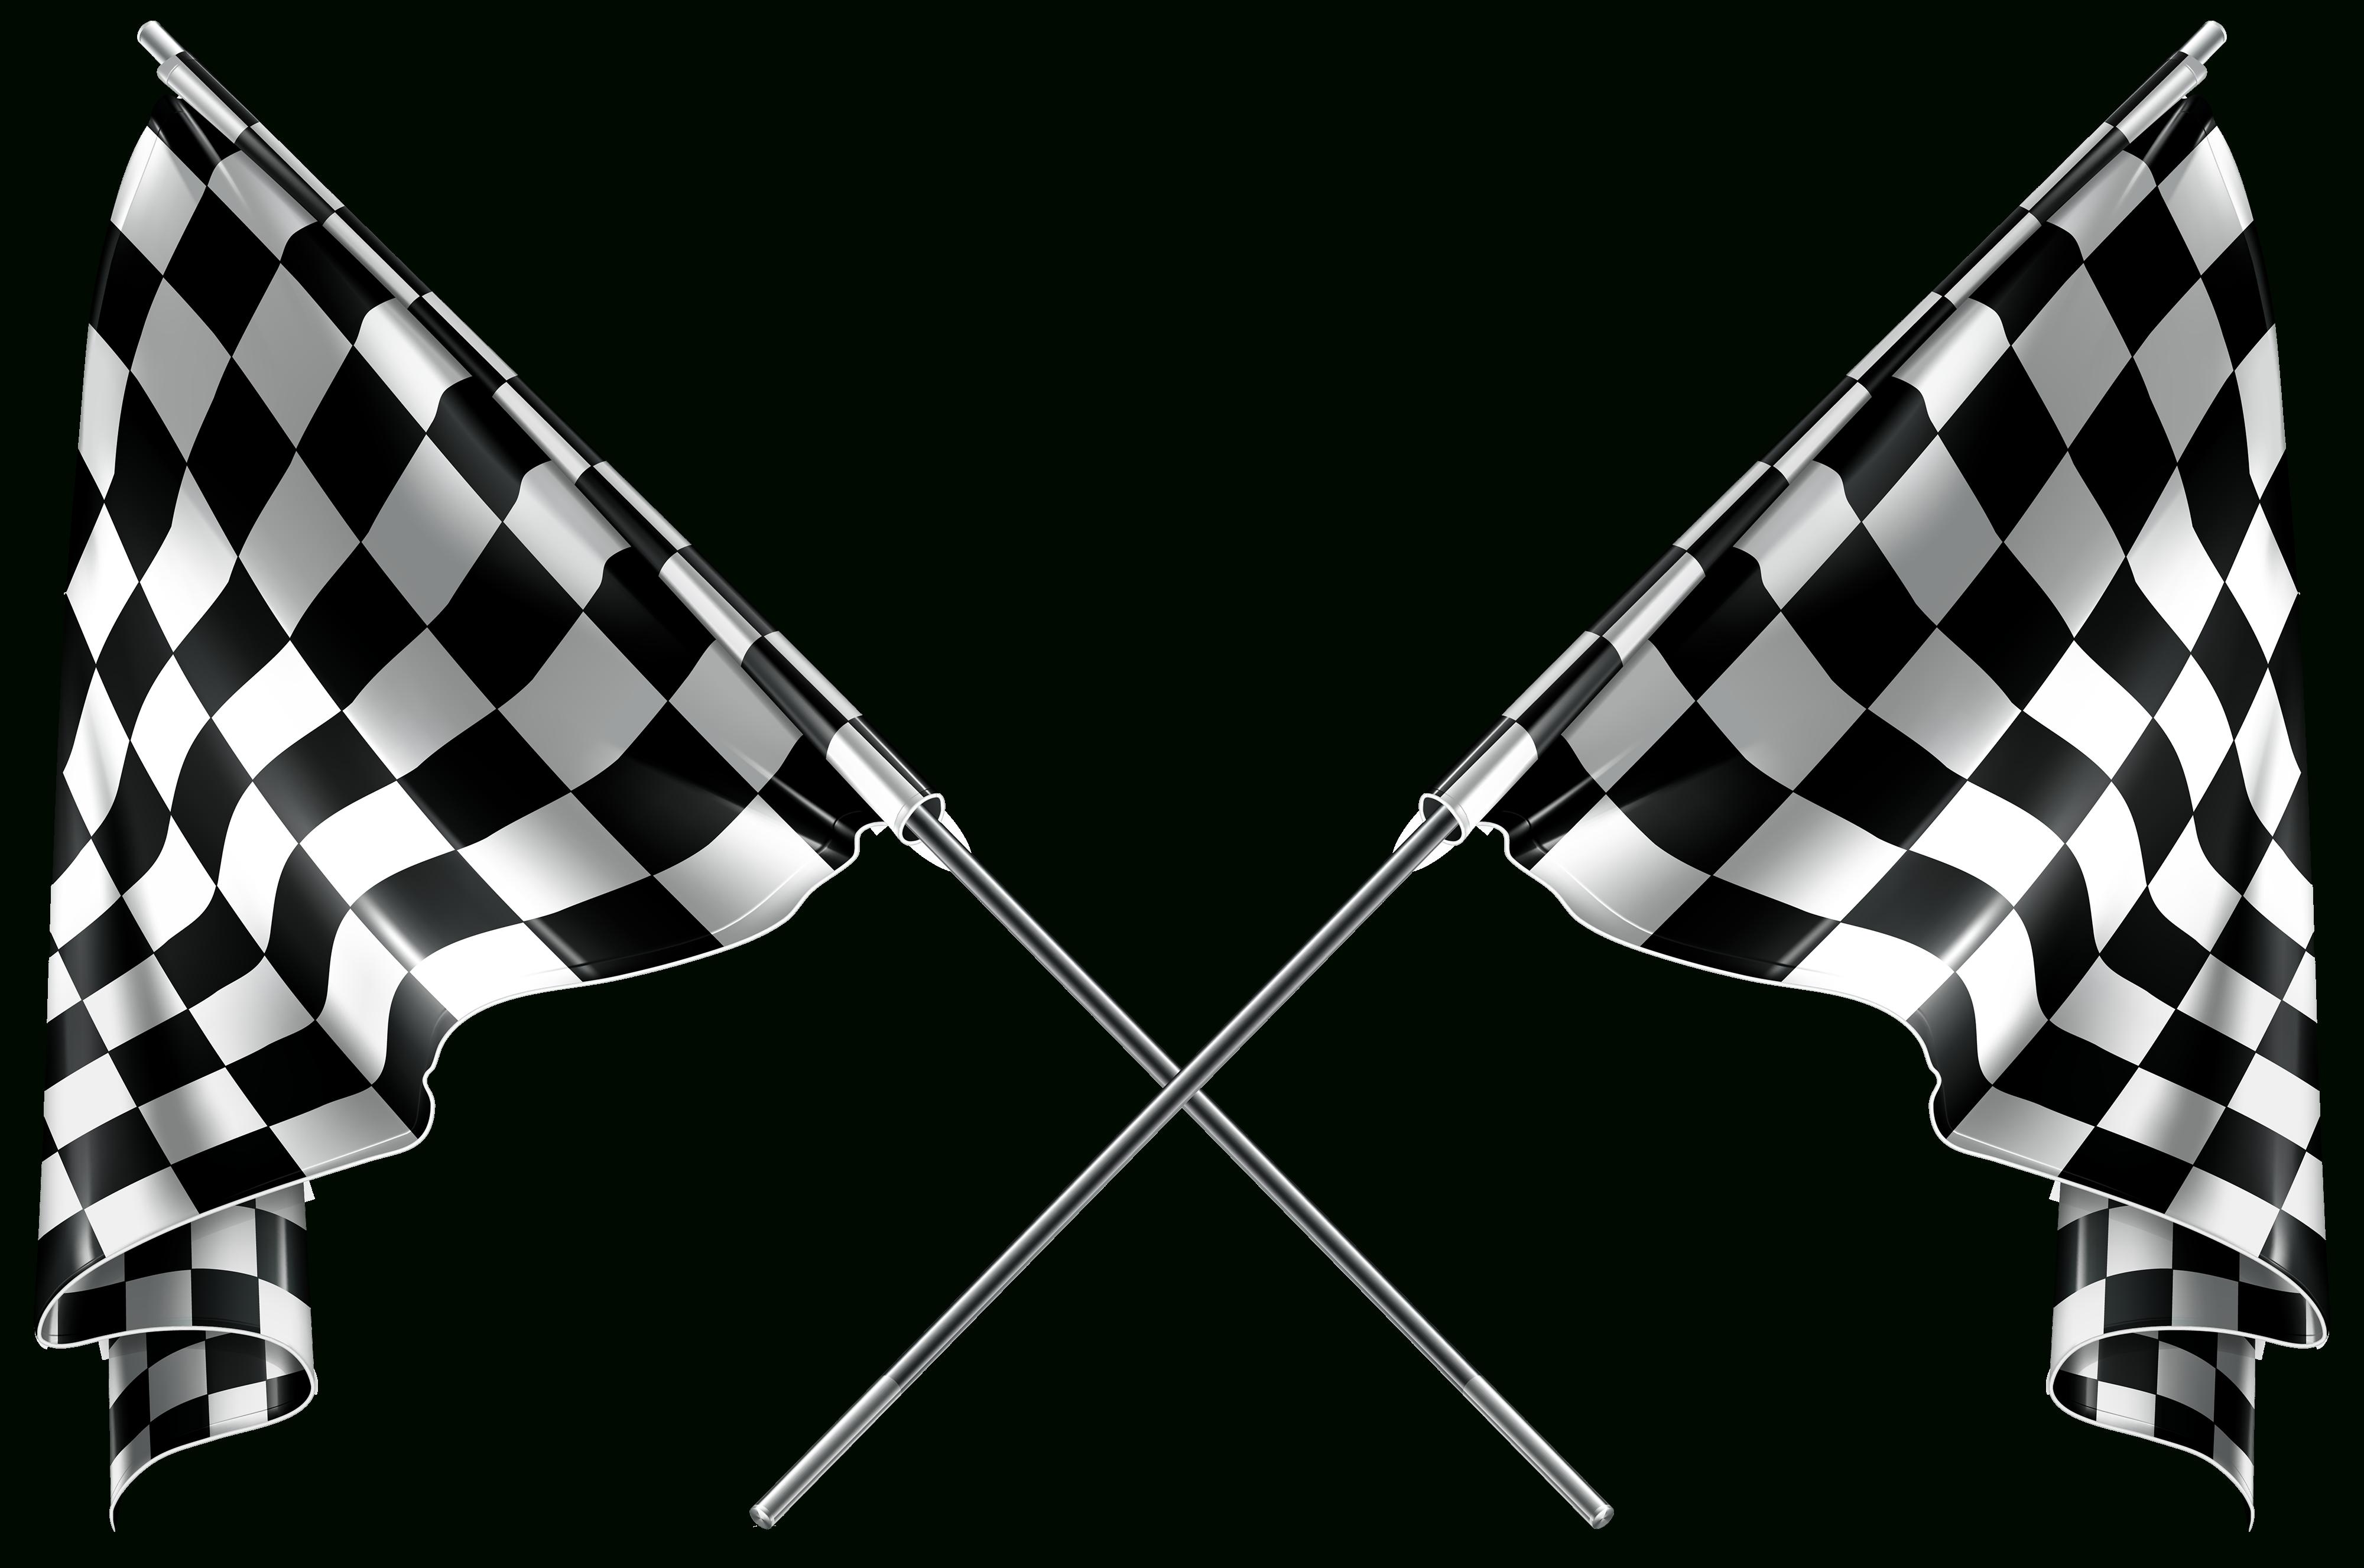 Checkered Flag Clip Art - Clipartbarn - Free Printable Checkered Flag Banner